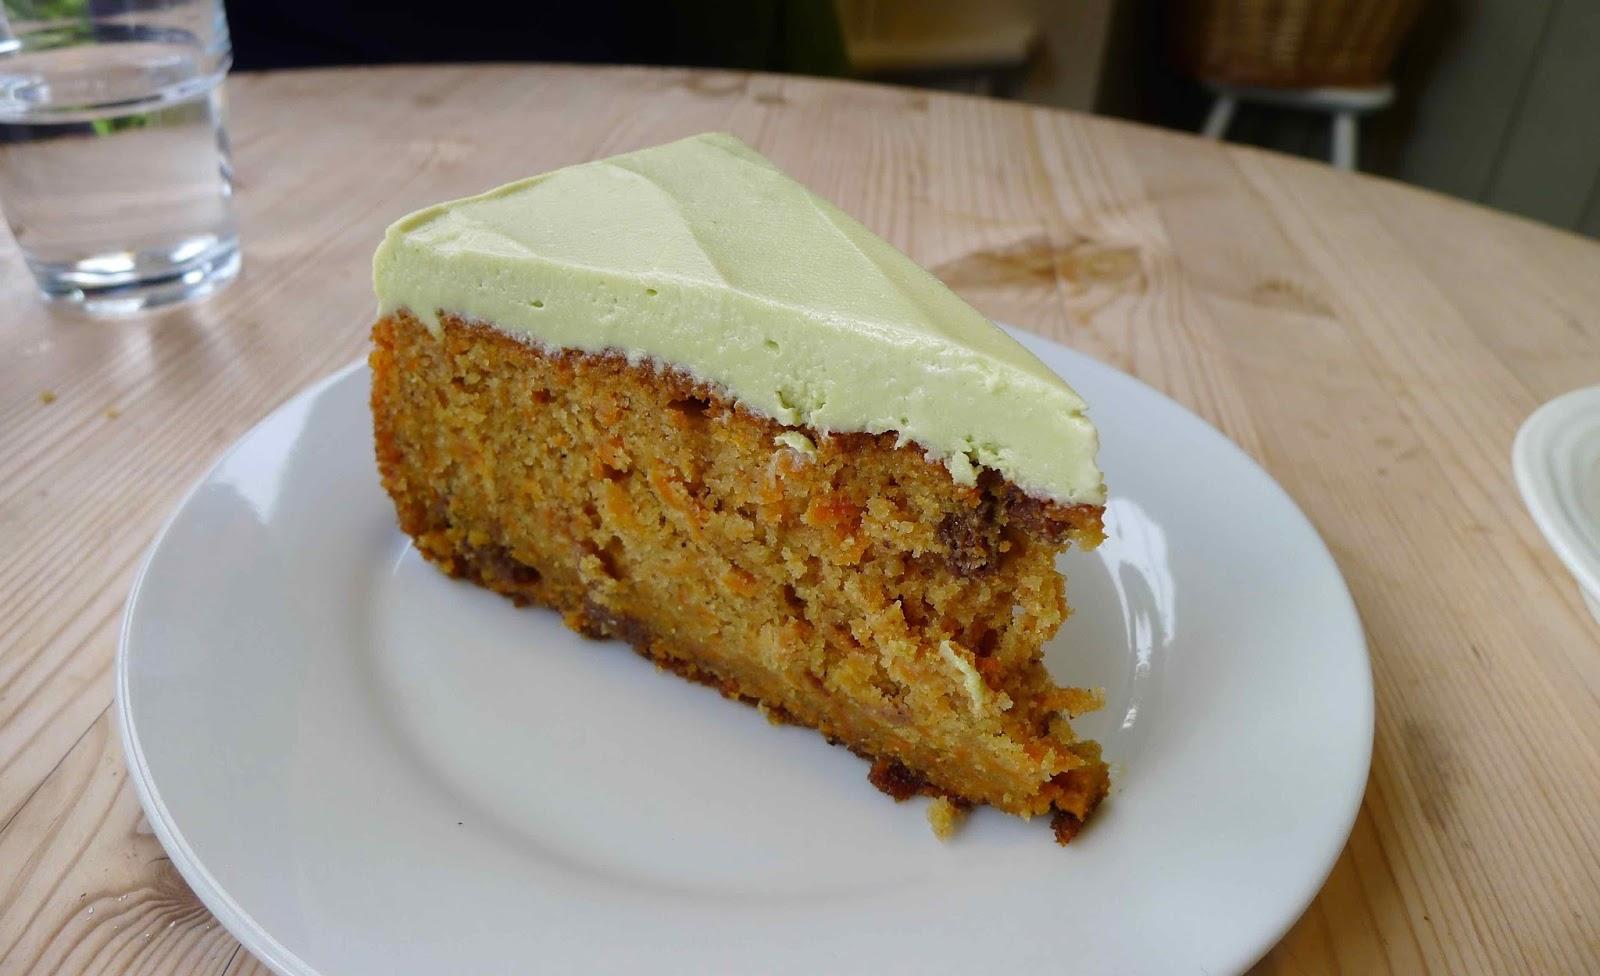 Savoury Spiced Carrot Cake